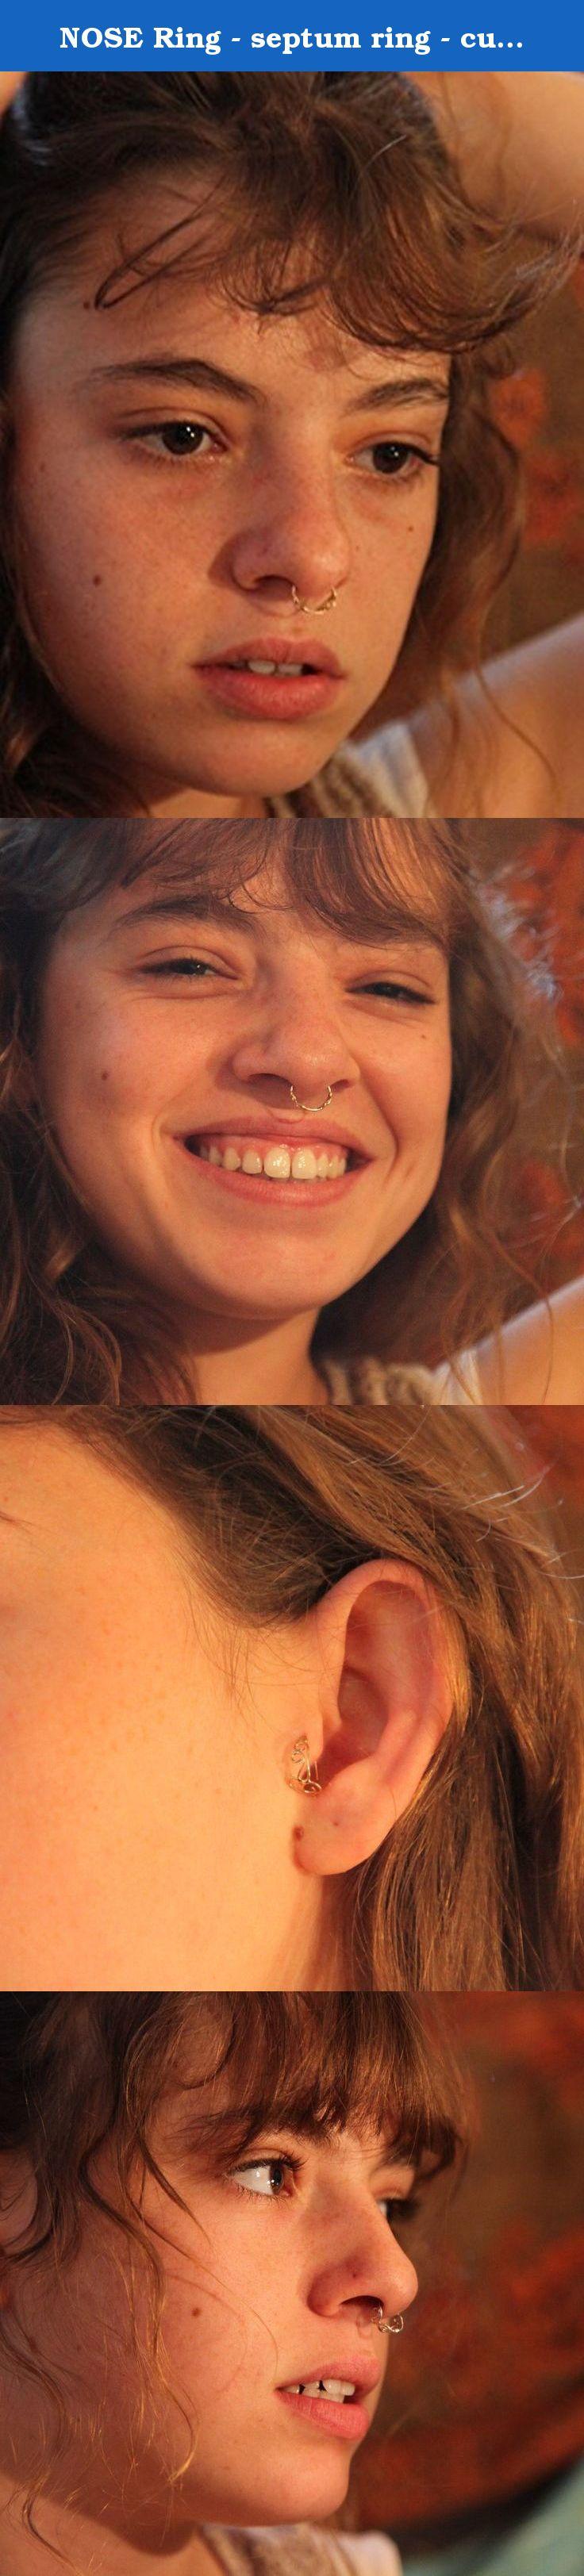 Septum piercing aesthetic  NOSE Ring  septum ring  curls Gold nose ring k yellow gold